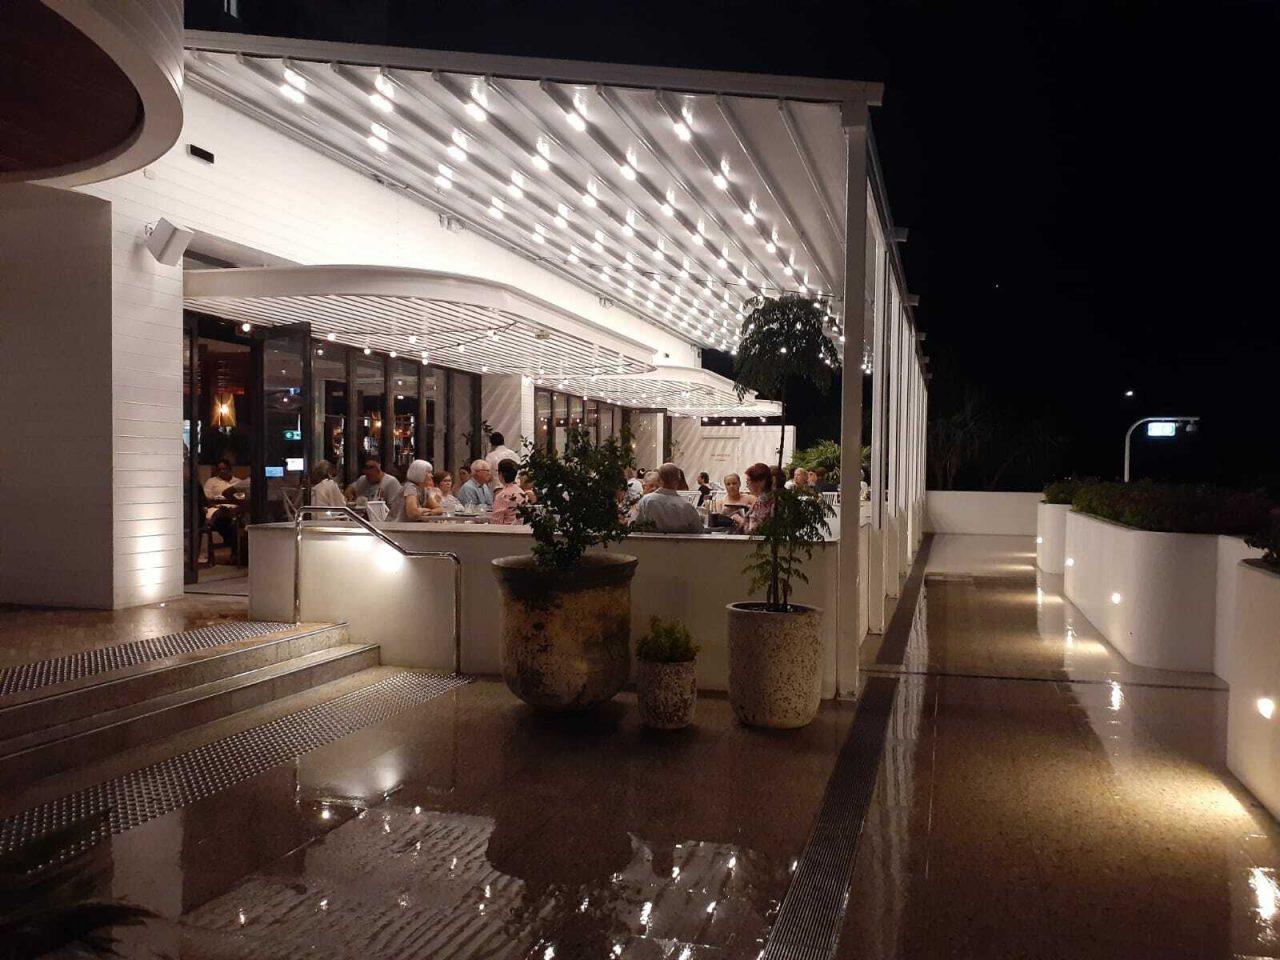 Commercial Awnings Motorised-Waterproof-Retractable-Louvre-Roof-System-Terrace-Pergola-LED-Lighting-Rooftop-Bar-Brisbane